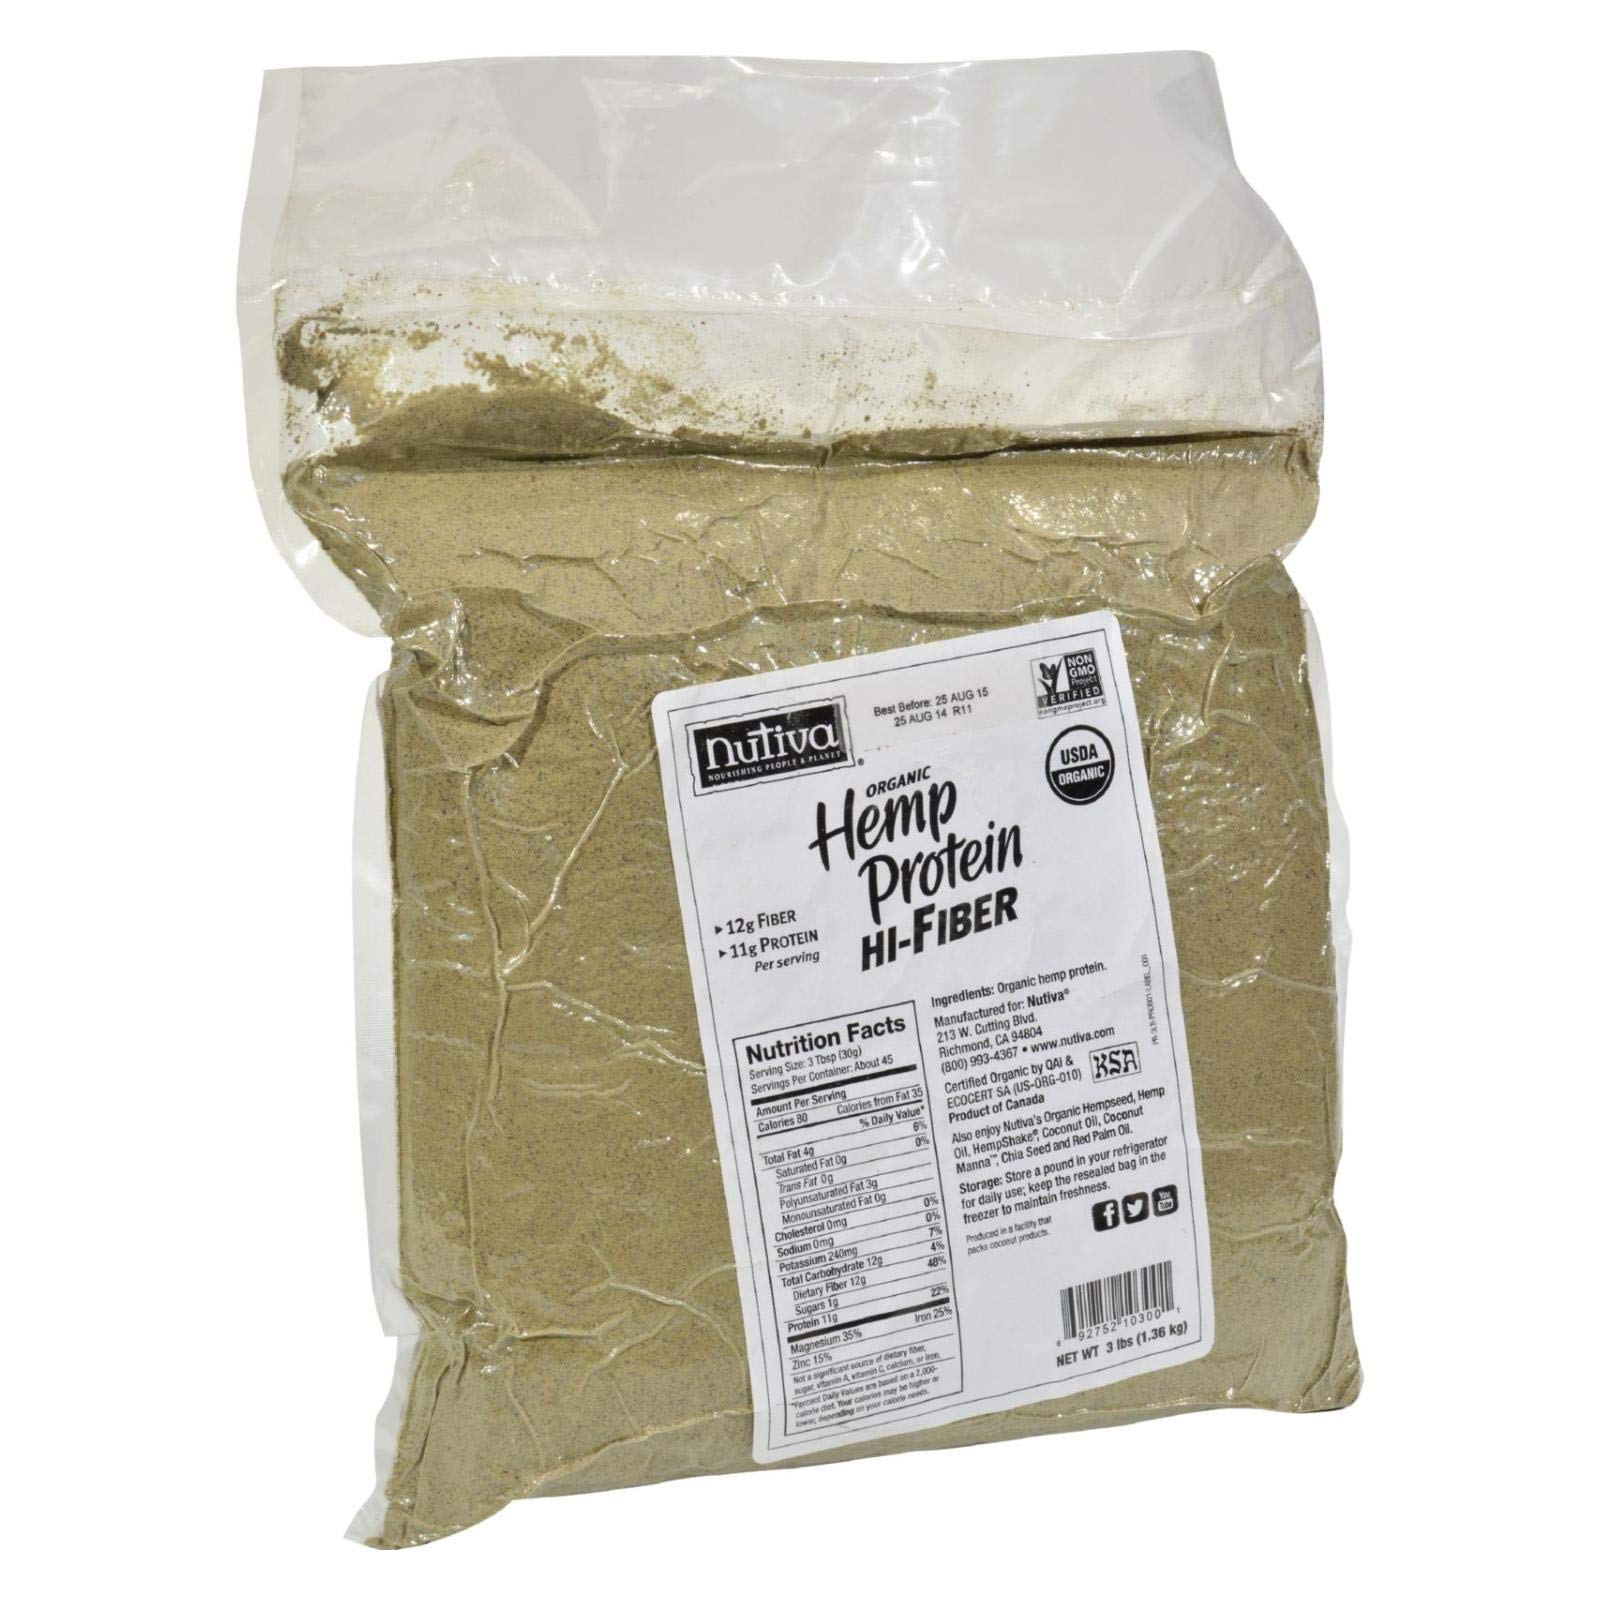 Nutiva Organic Hemp Protein Hi-Fiber - 3 lbs - 95%+ Organic - Vegan - Extremely nutritious and Delicious